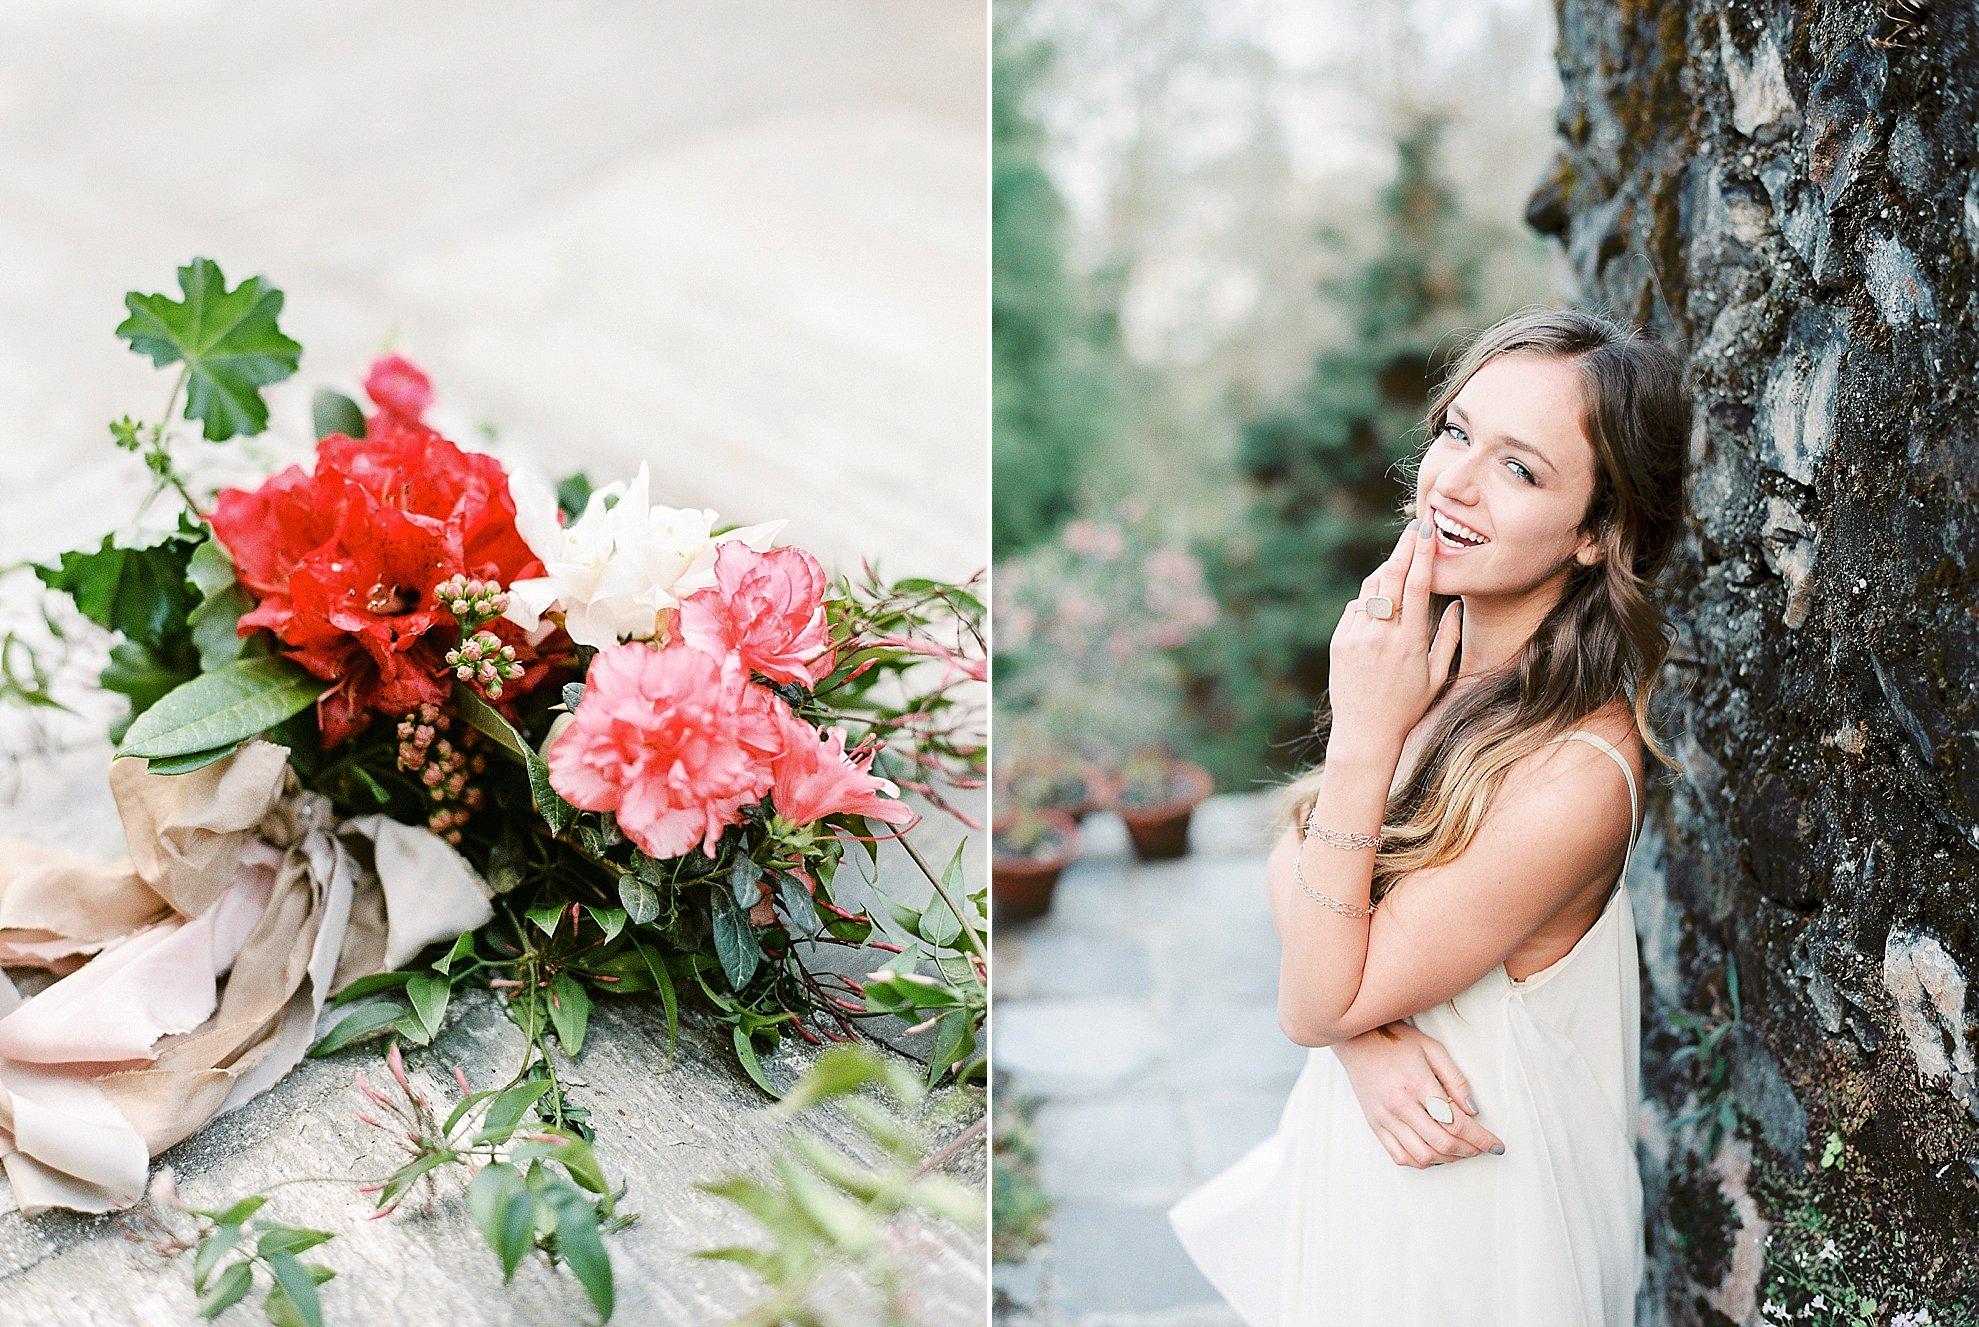 Bianca-Rijkenbarg-fotografie-for-this-romance-bruidsinspiratie-blog_0017